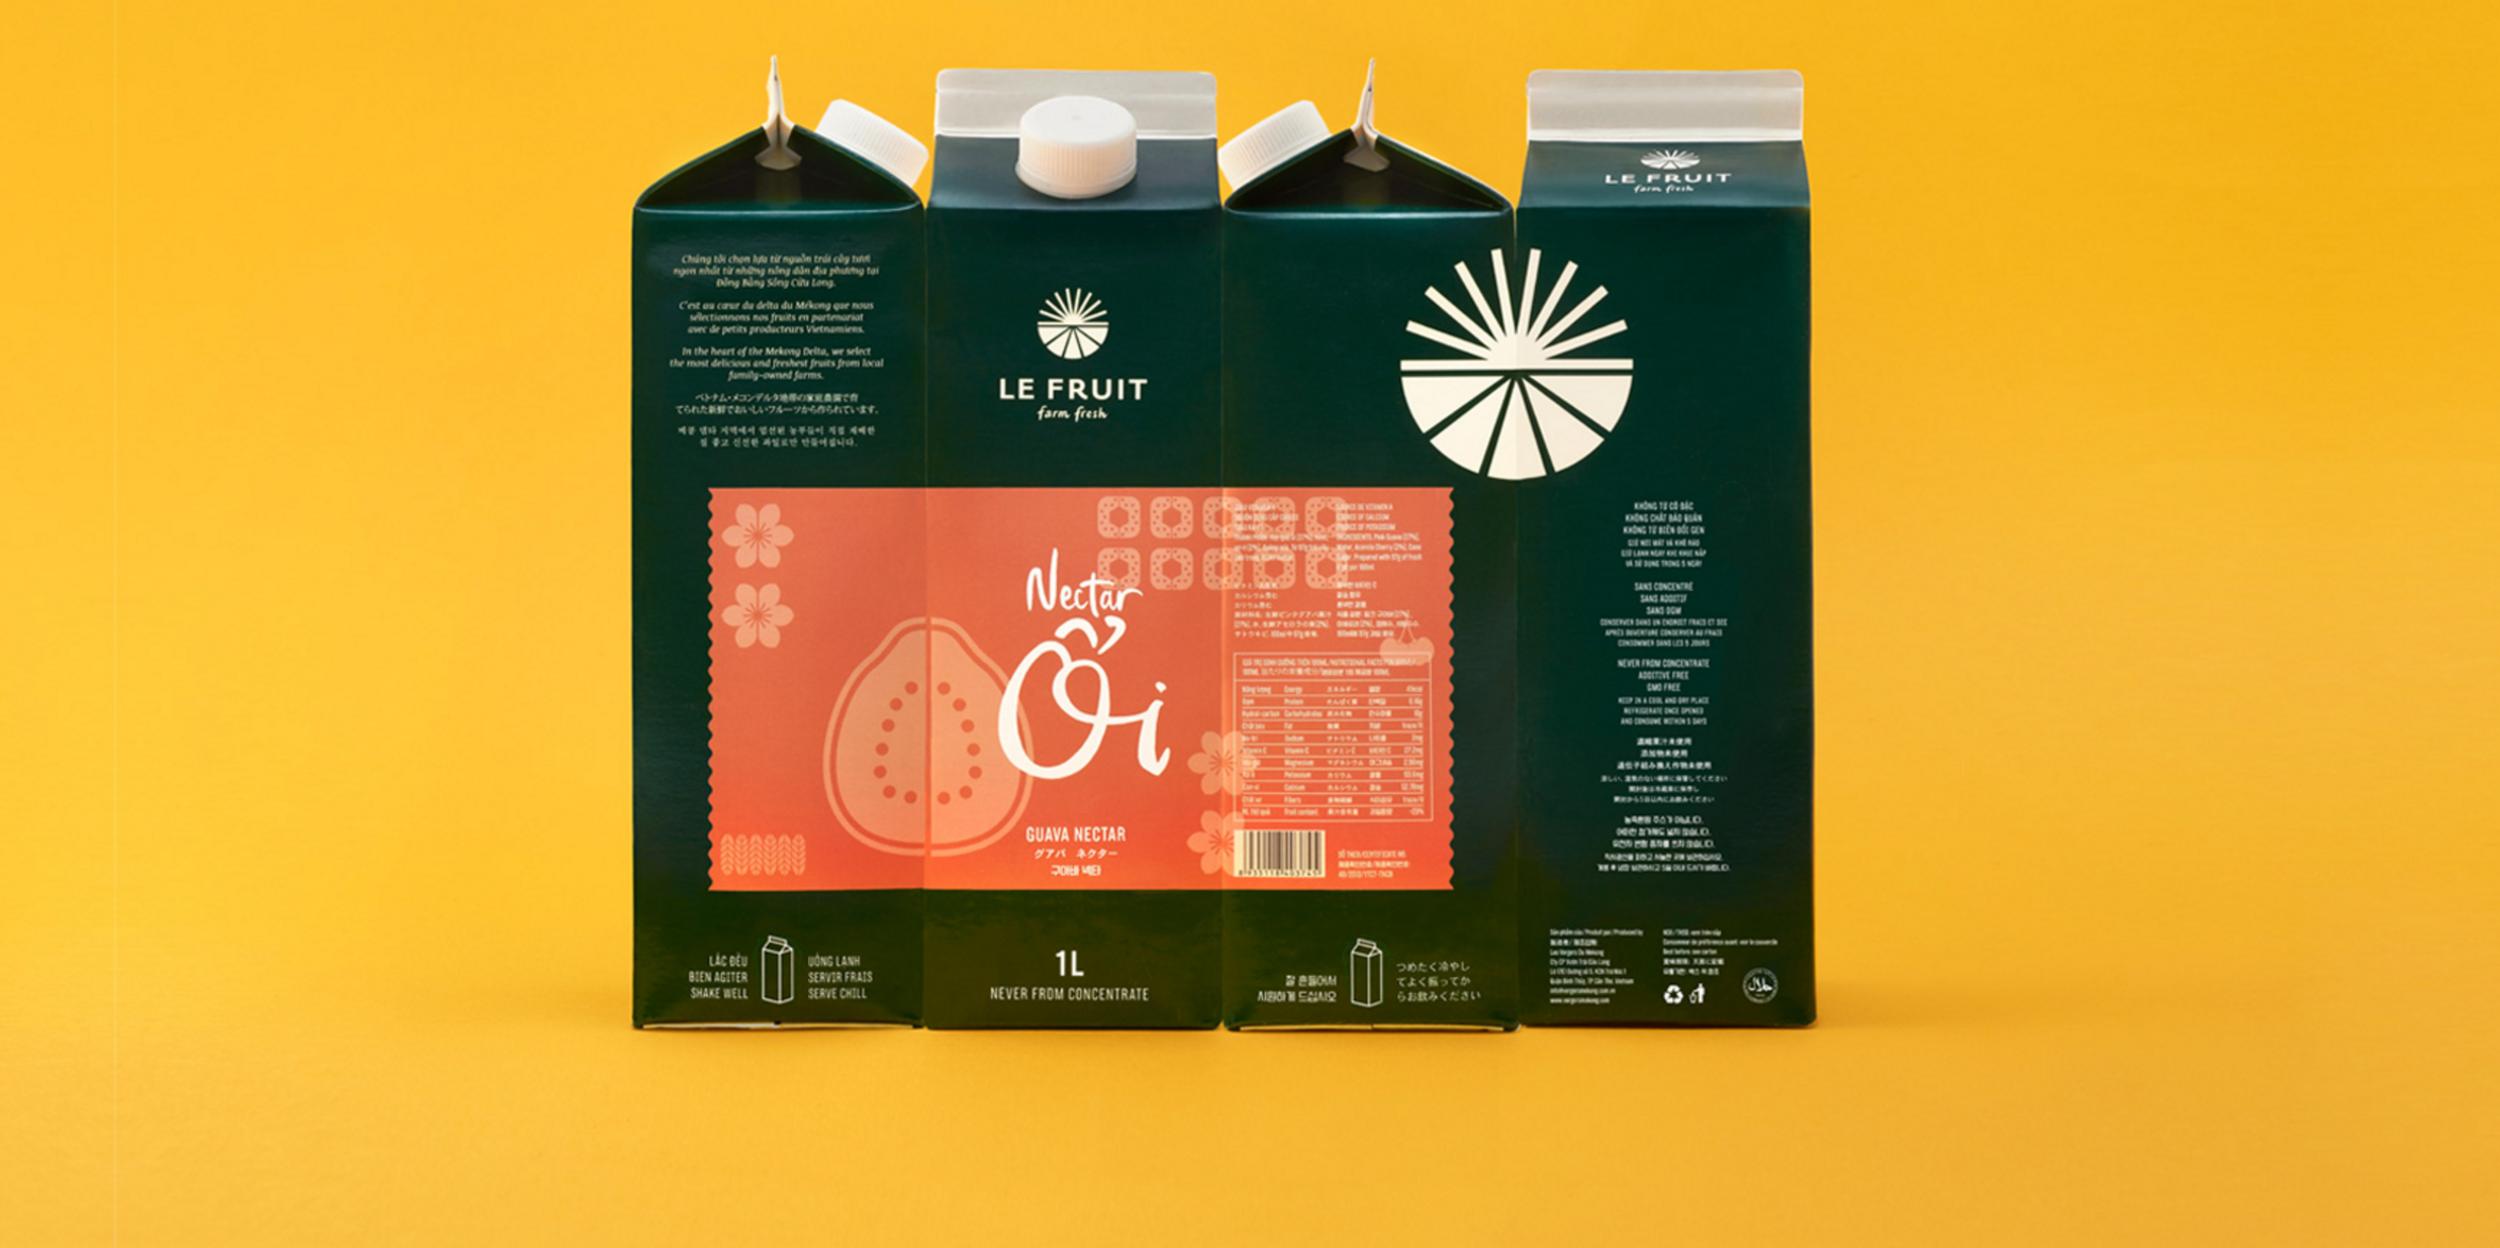 Le Fruit — The Dieline - Branding & Packaging Design